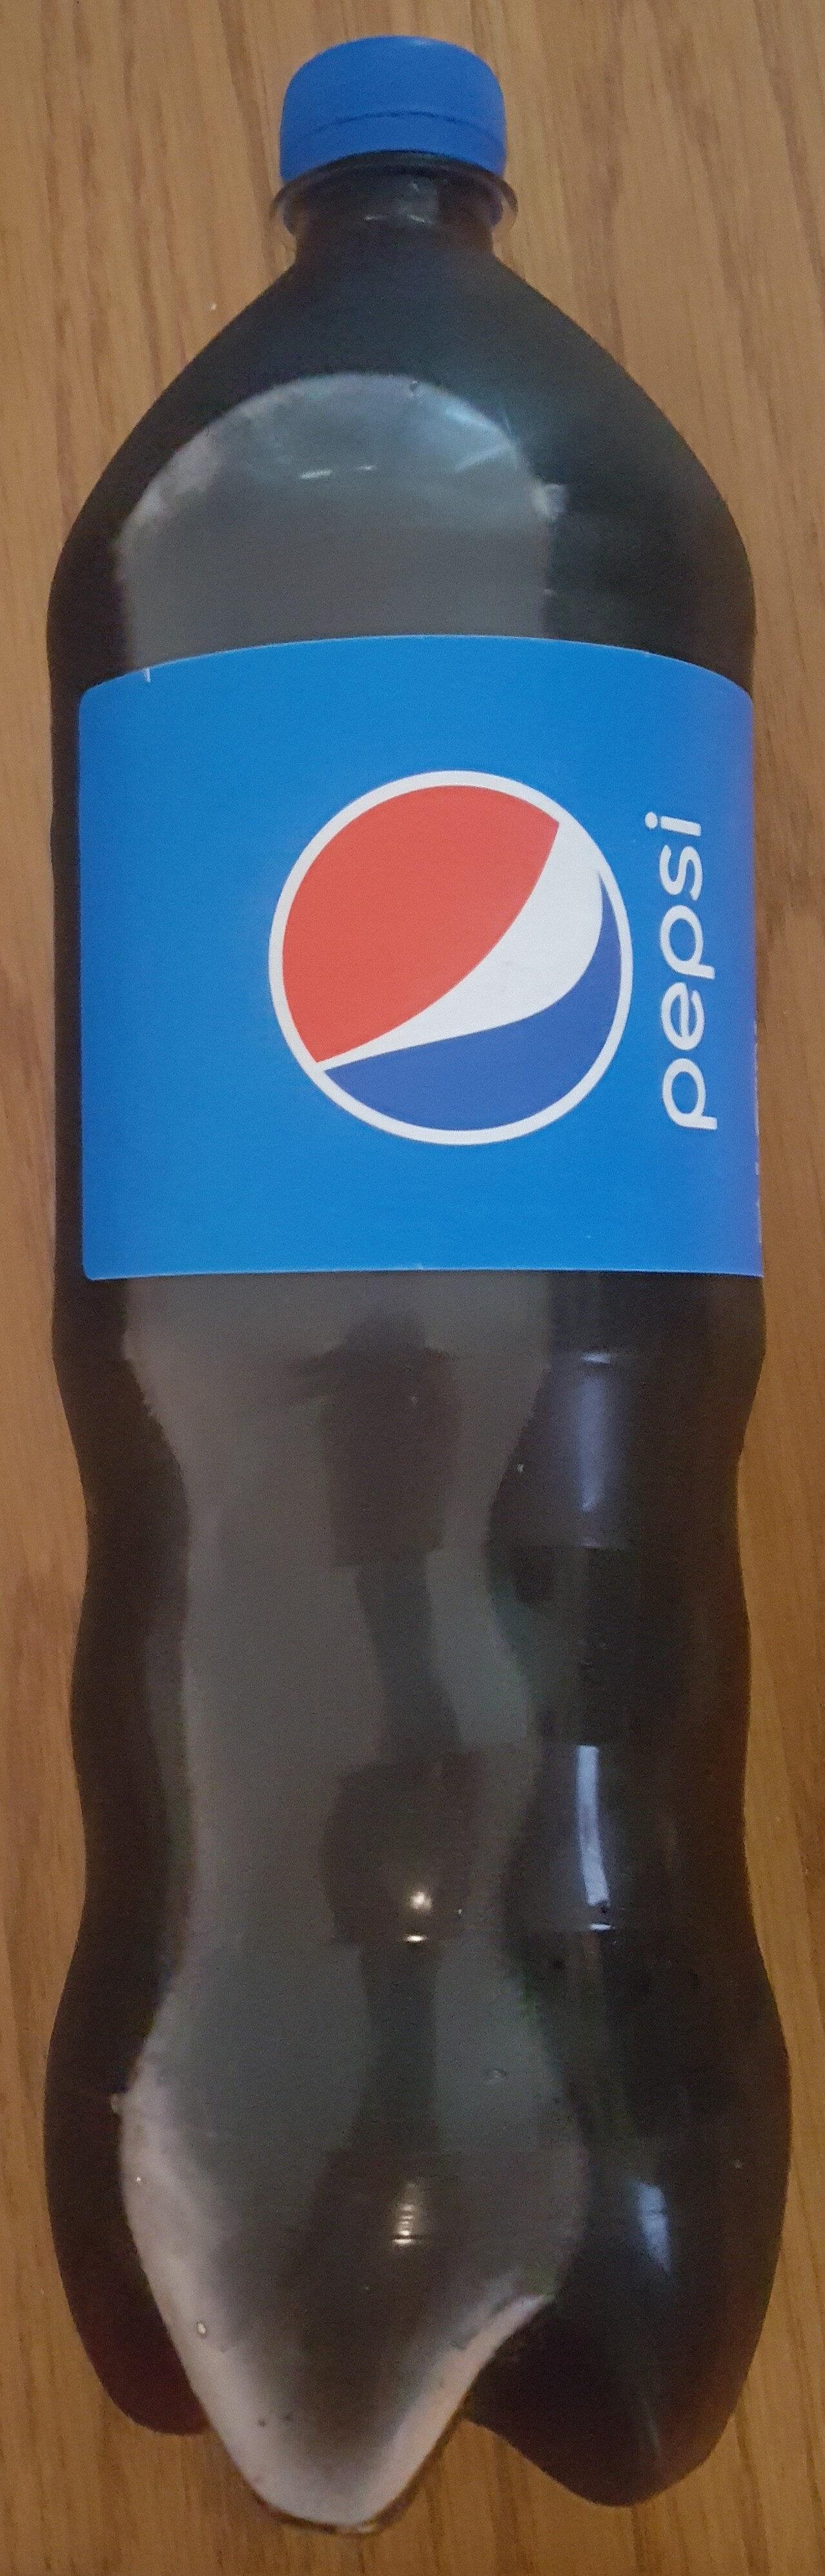 Pepsi - Produit - sv